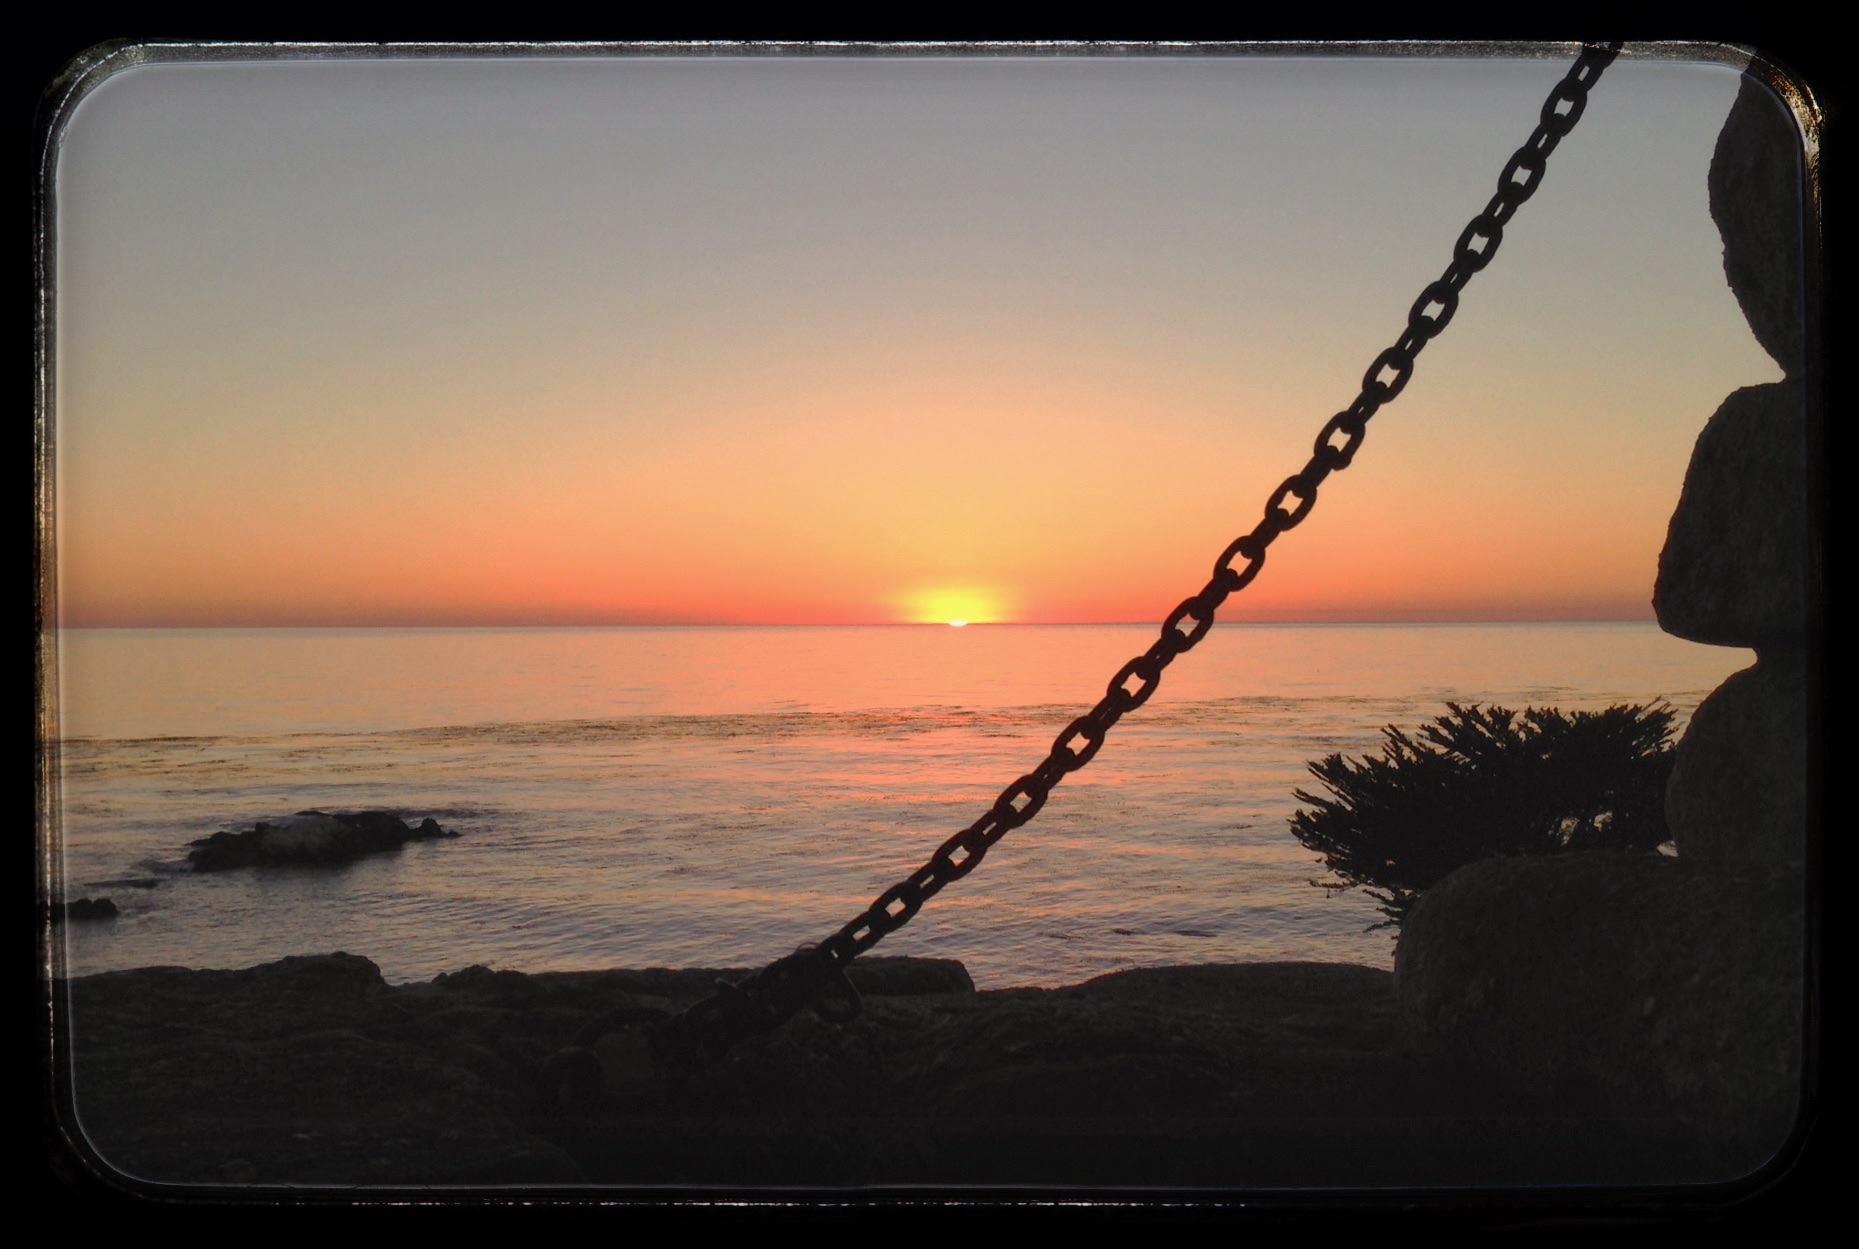 hawk tower chain sunset view.jpg